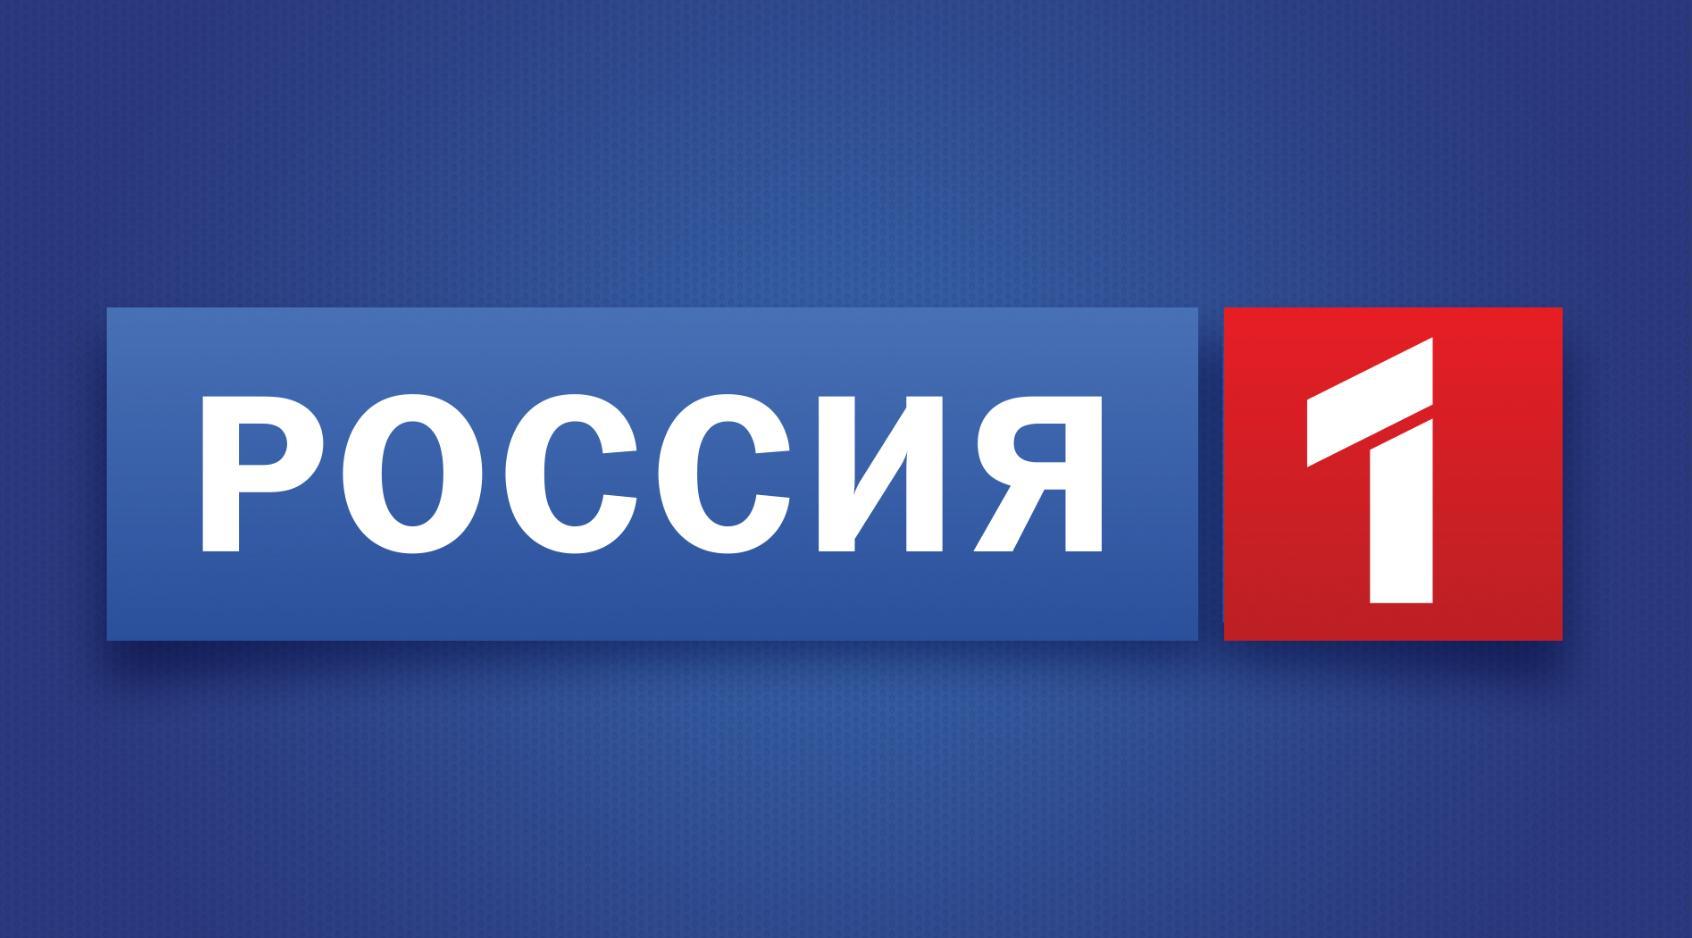 Программа передач по россия 1 сегодня